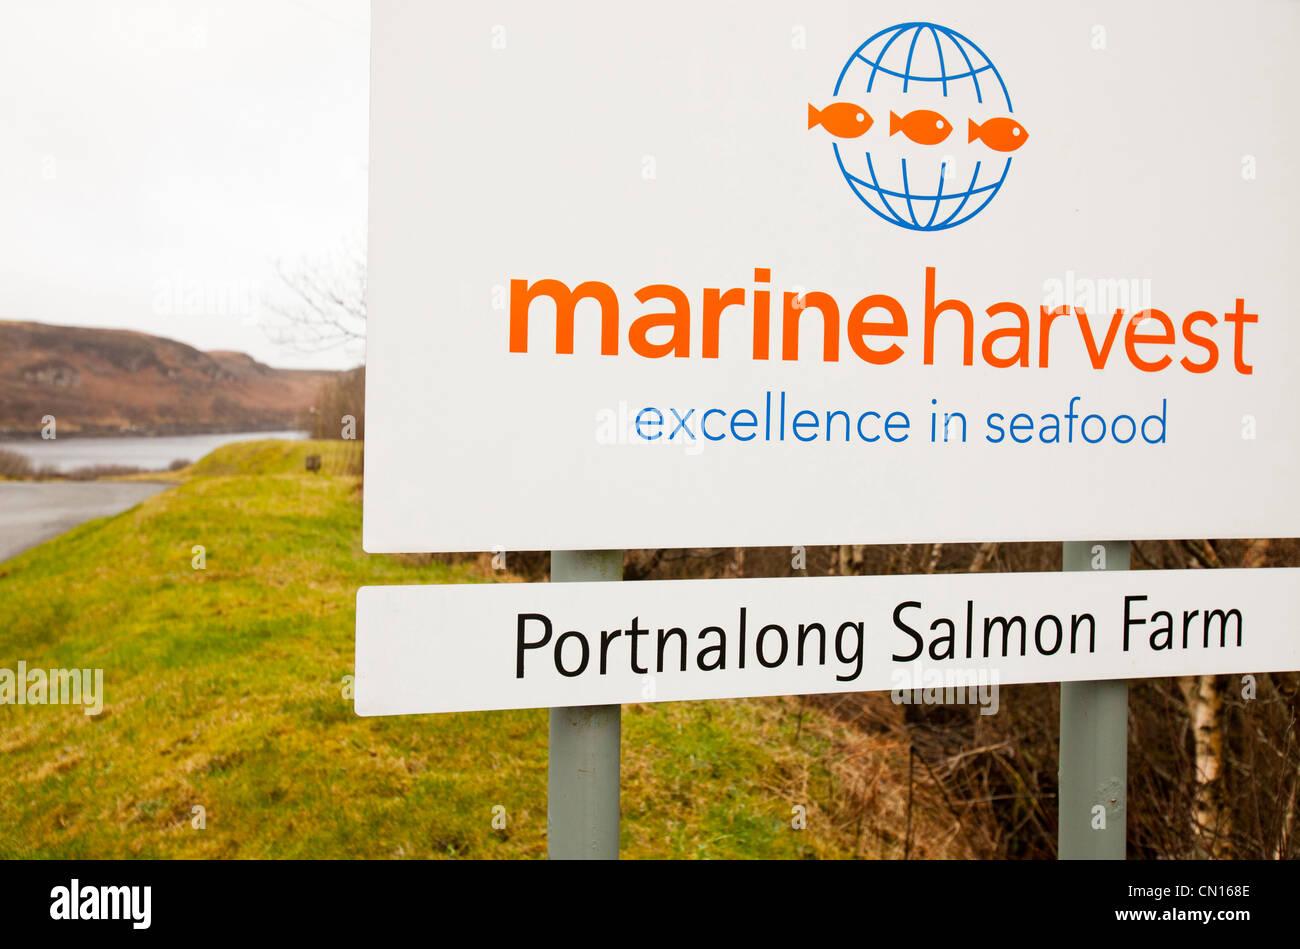 The Portnalong Salmon Farm, Isle of Skye, Scotland, UK. Stock Photo